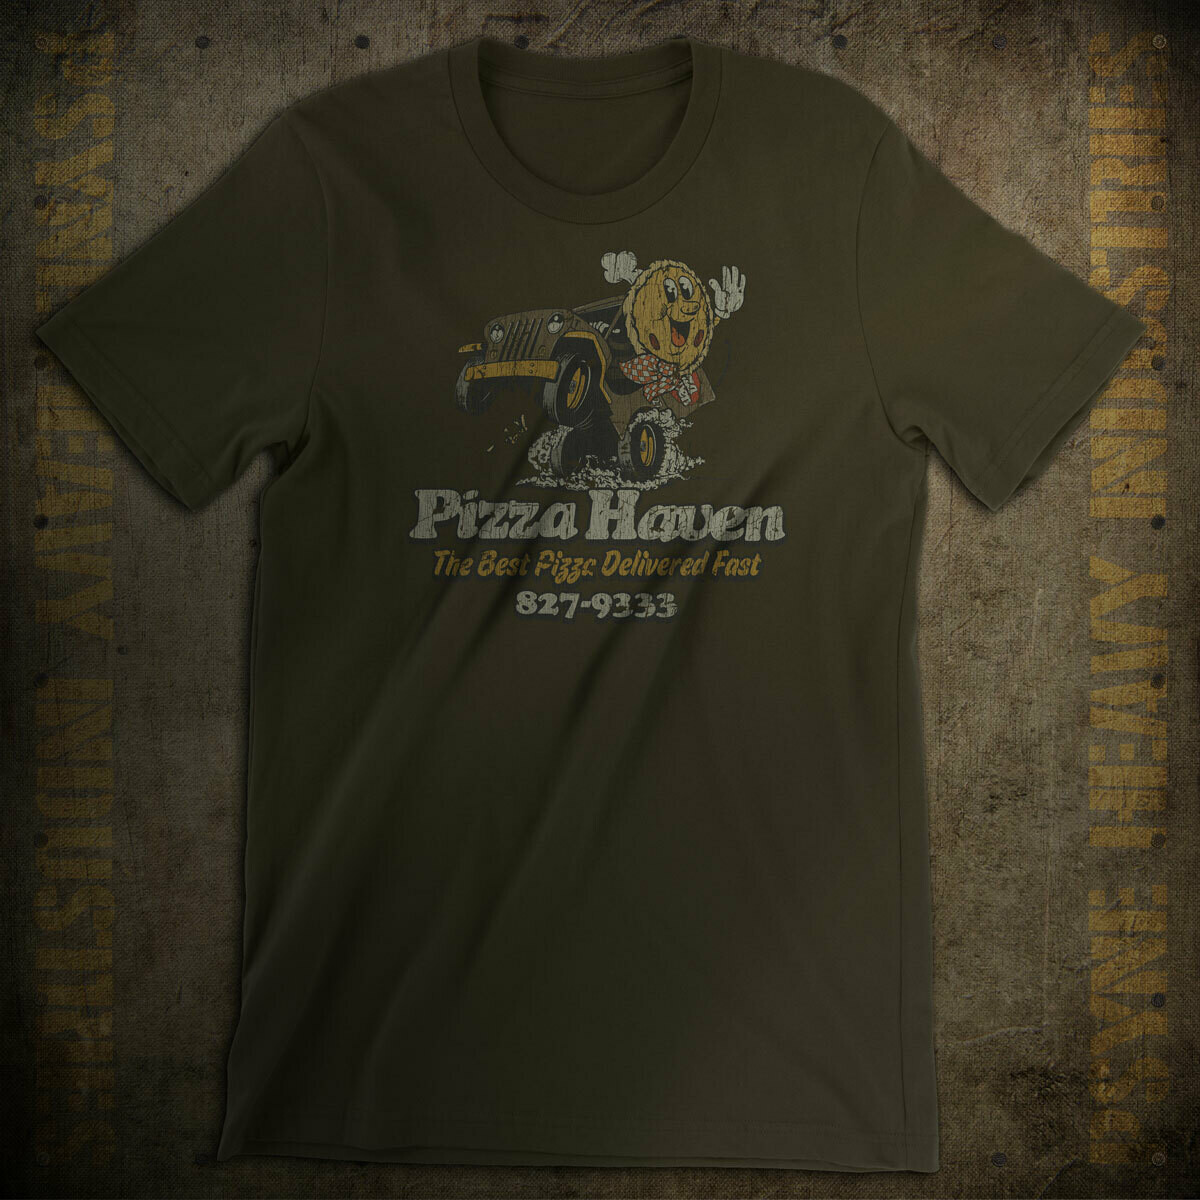 Pizza Haven Delivers Fast Vintage T-Shirt